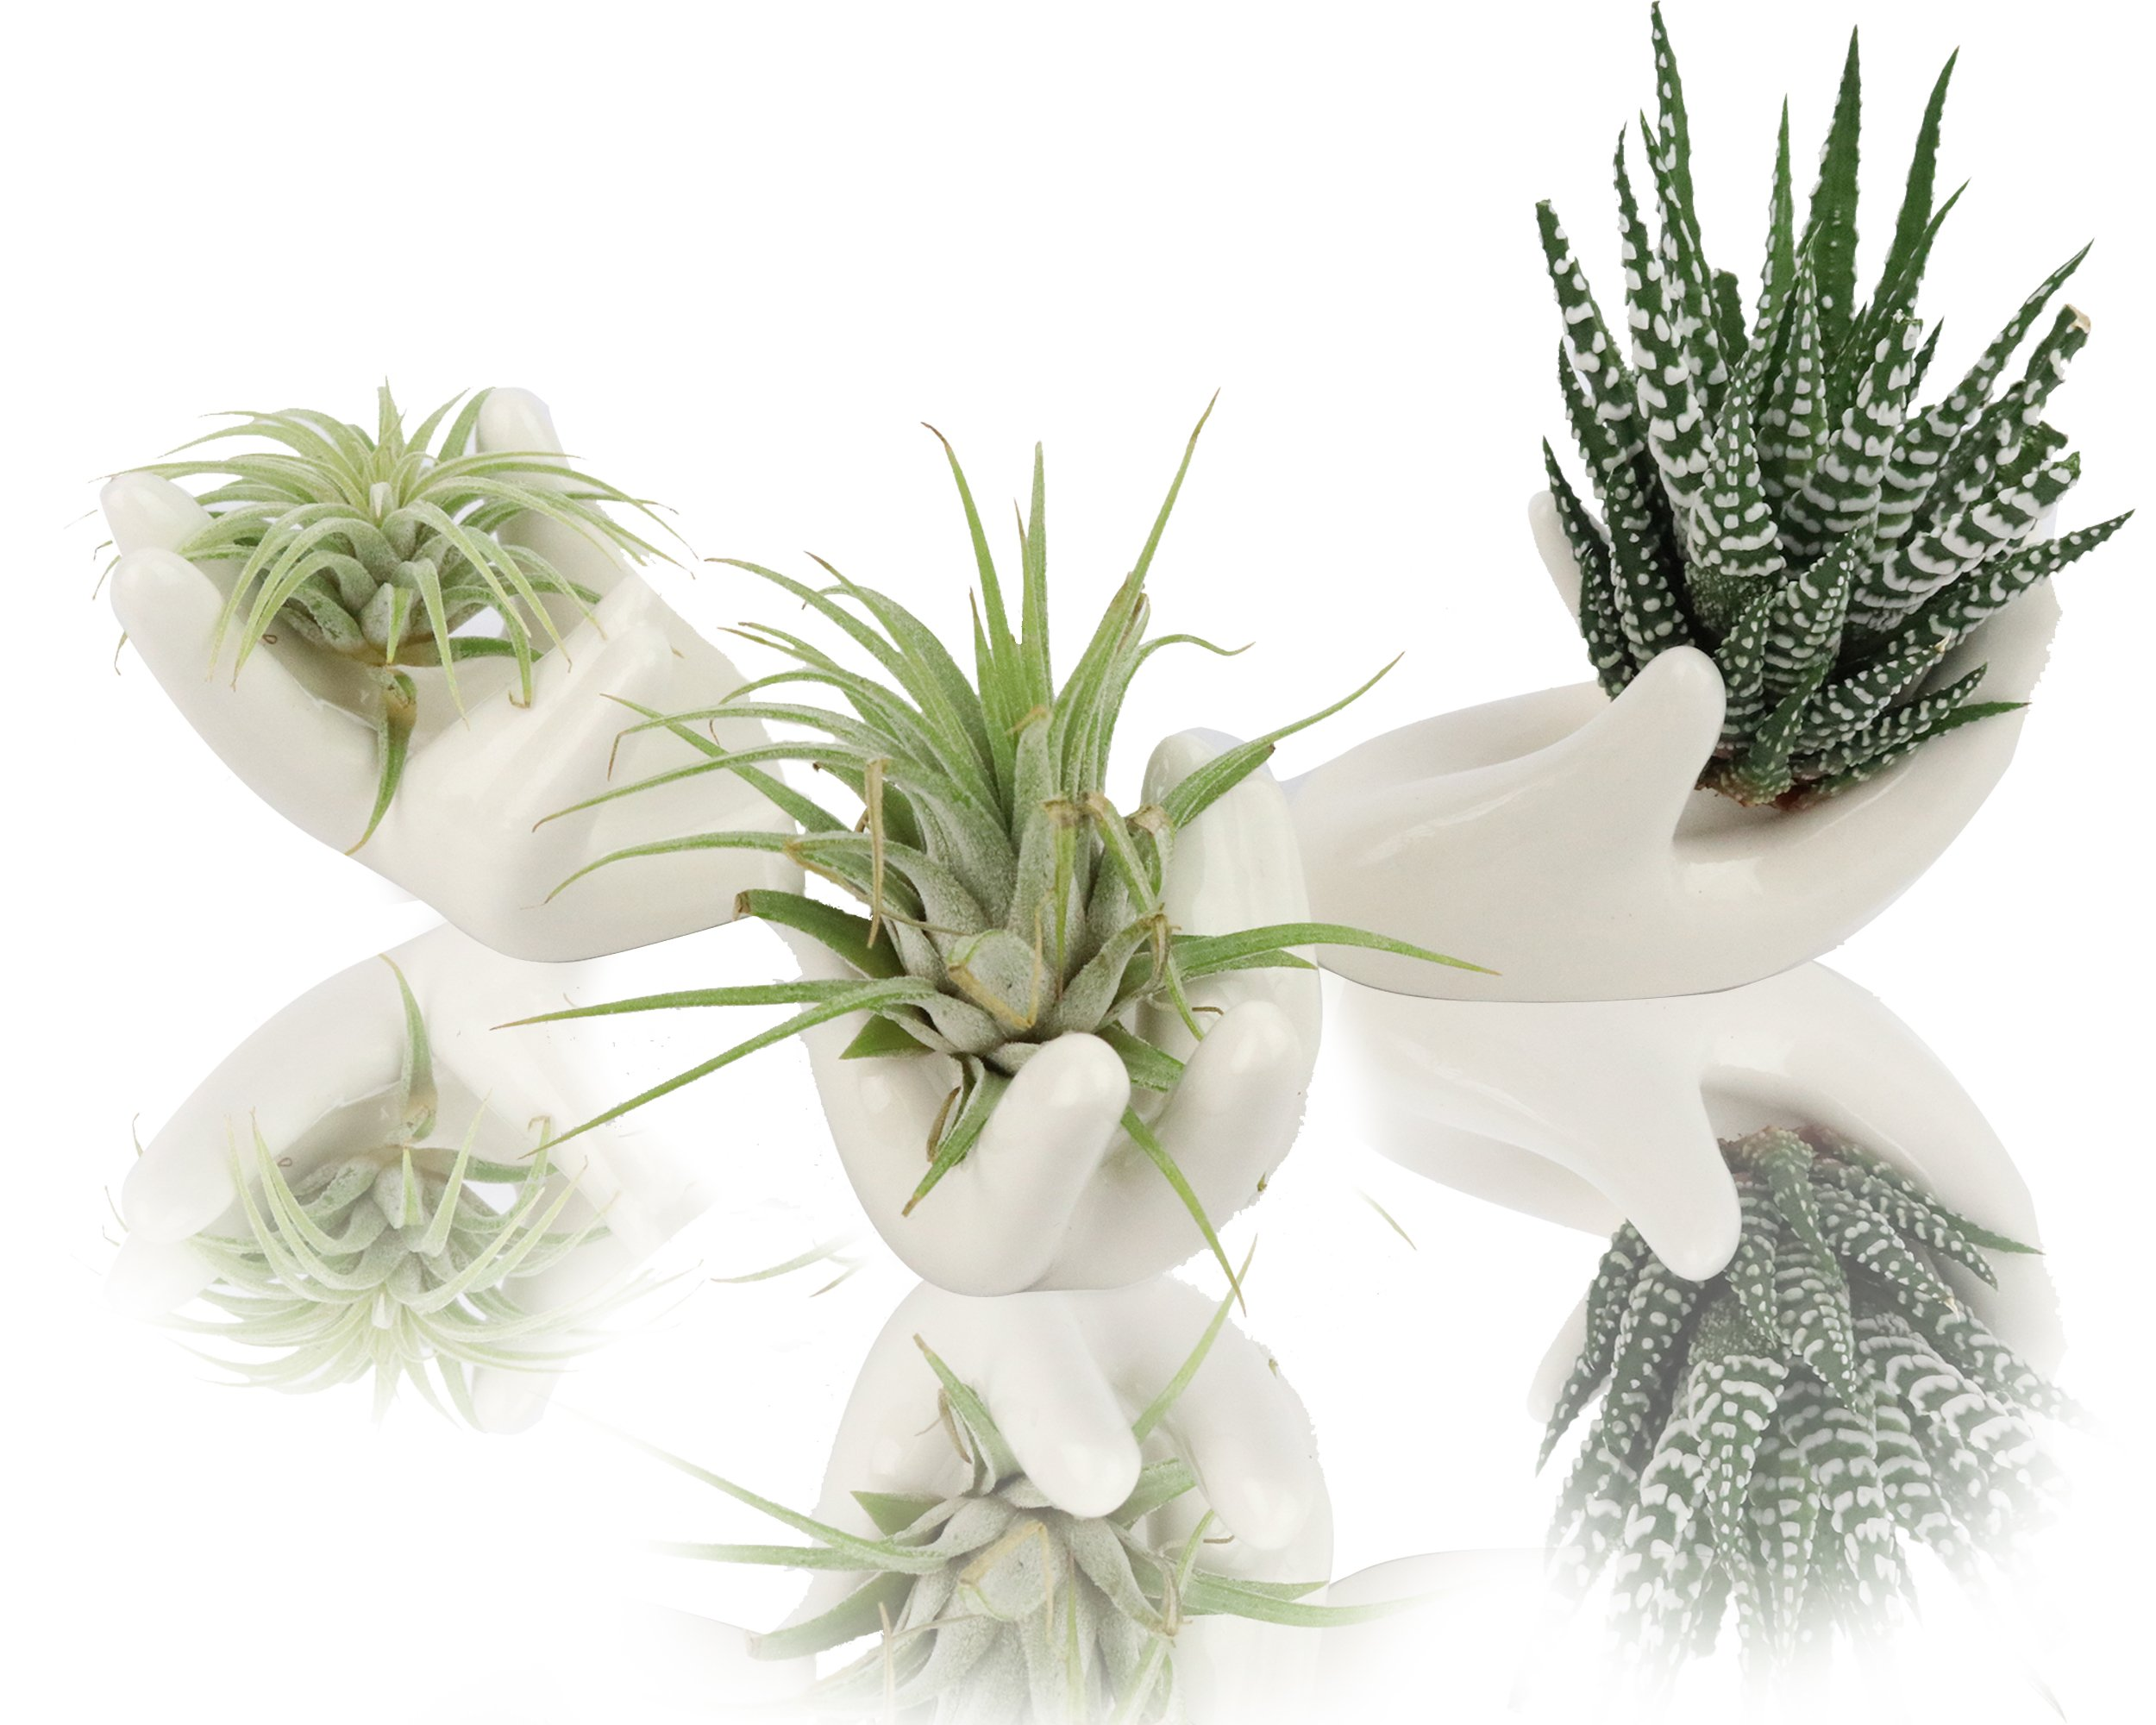 NeutralPure ECO Table Top Flower Pot Tillandsia Air Plant Holder; Multipurpose Ceramic Porcelain Artware Decorator (3 Pcs)